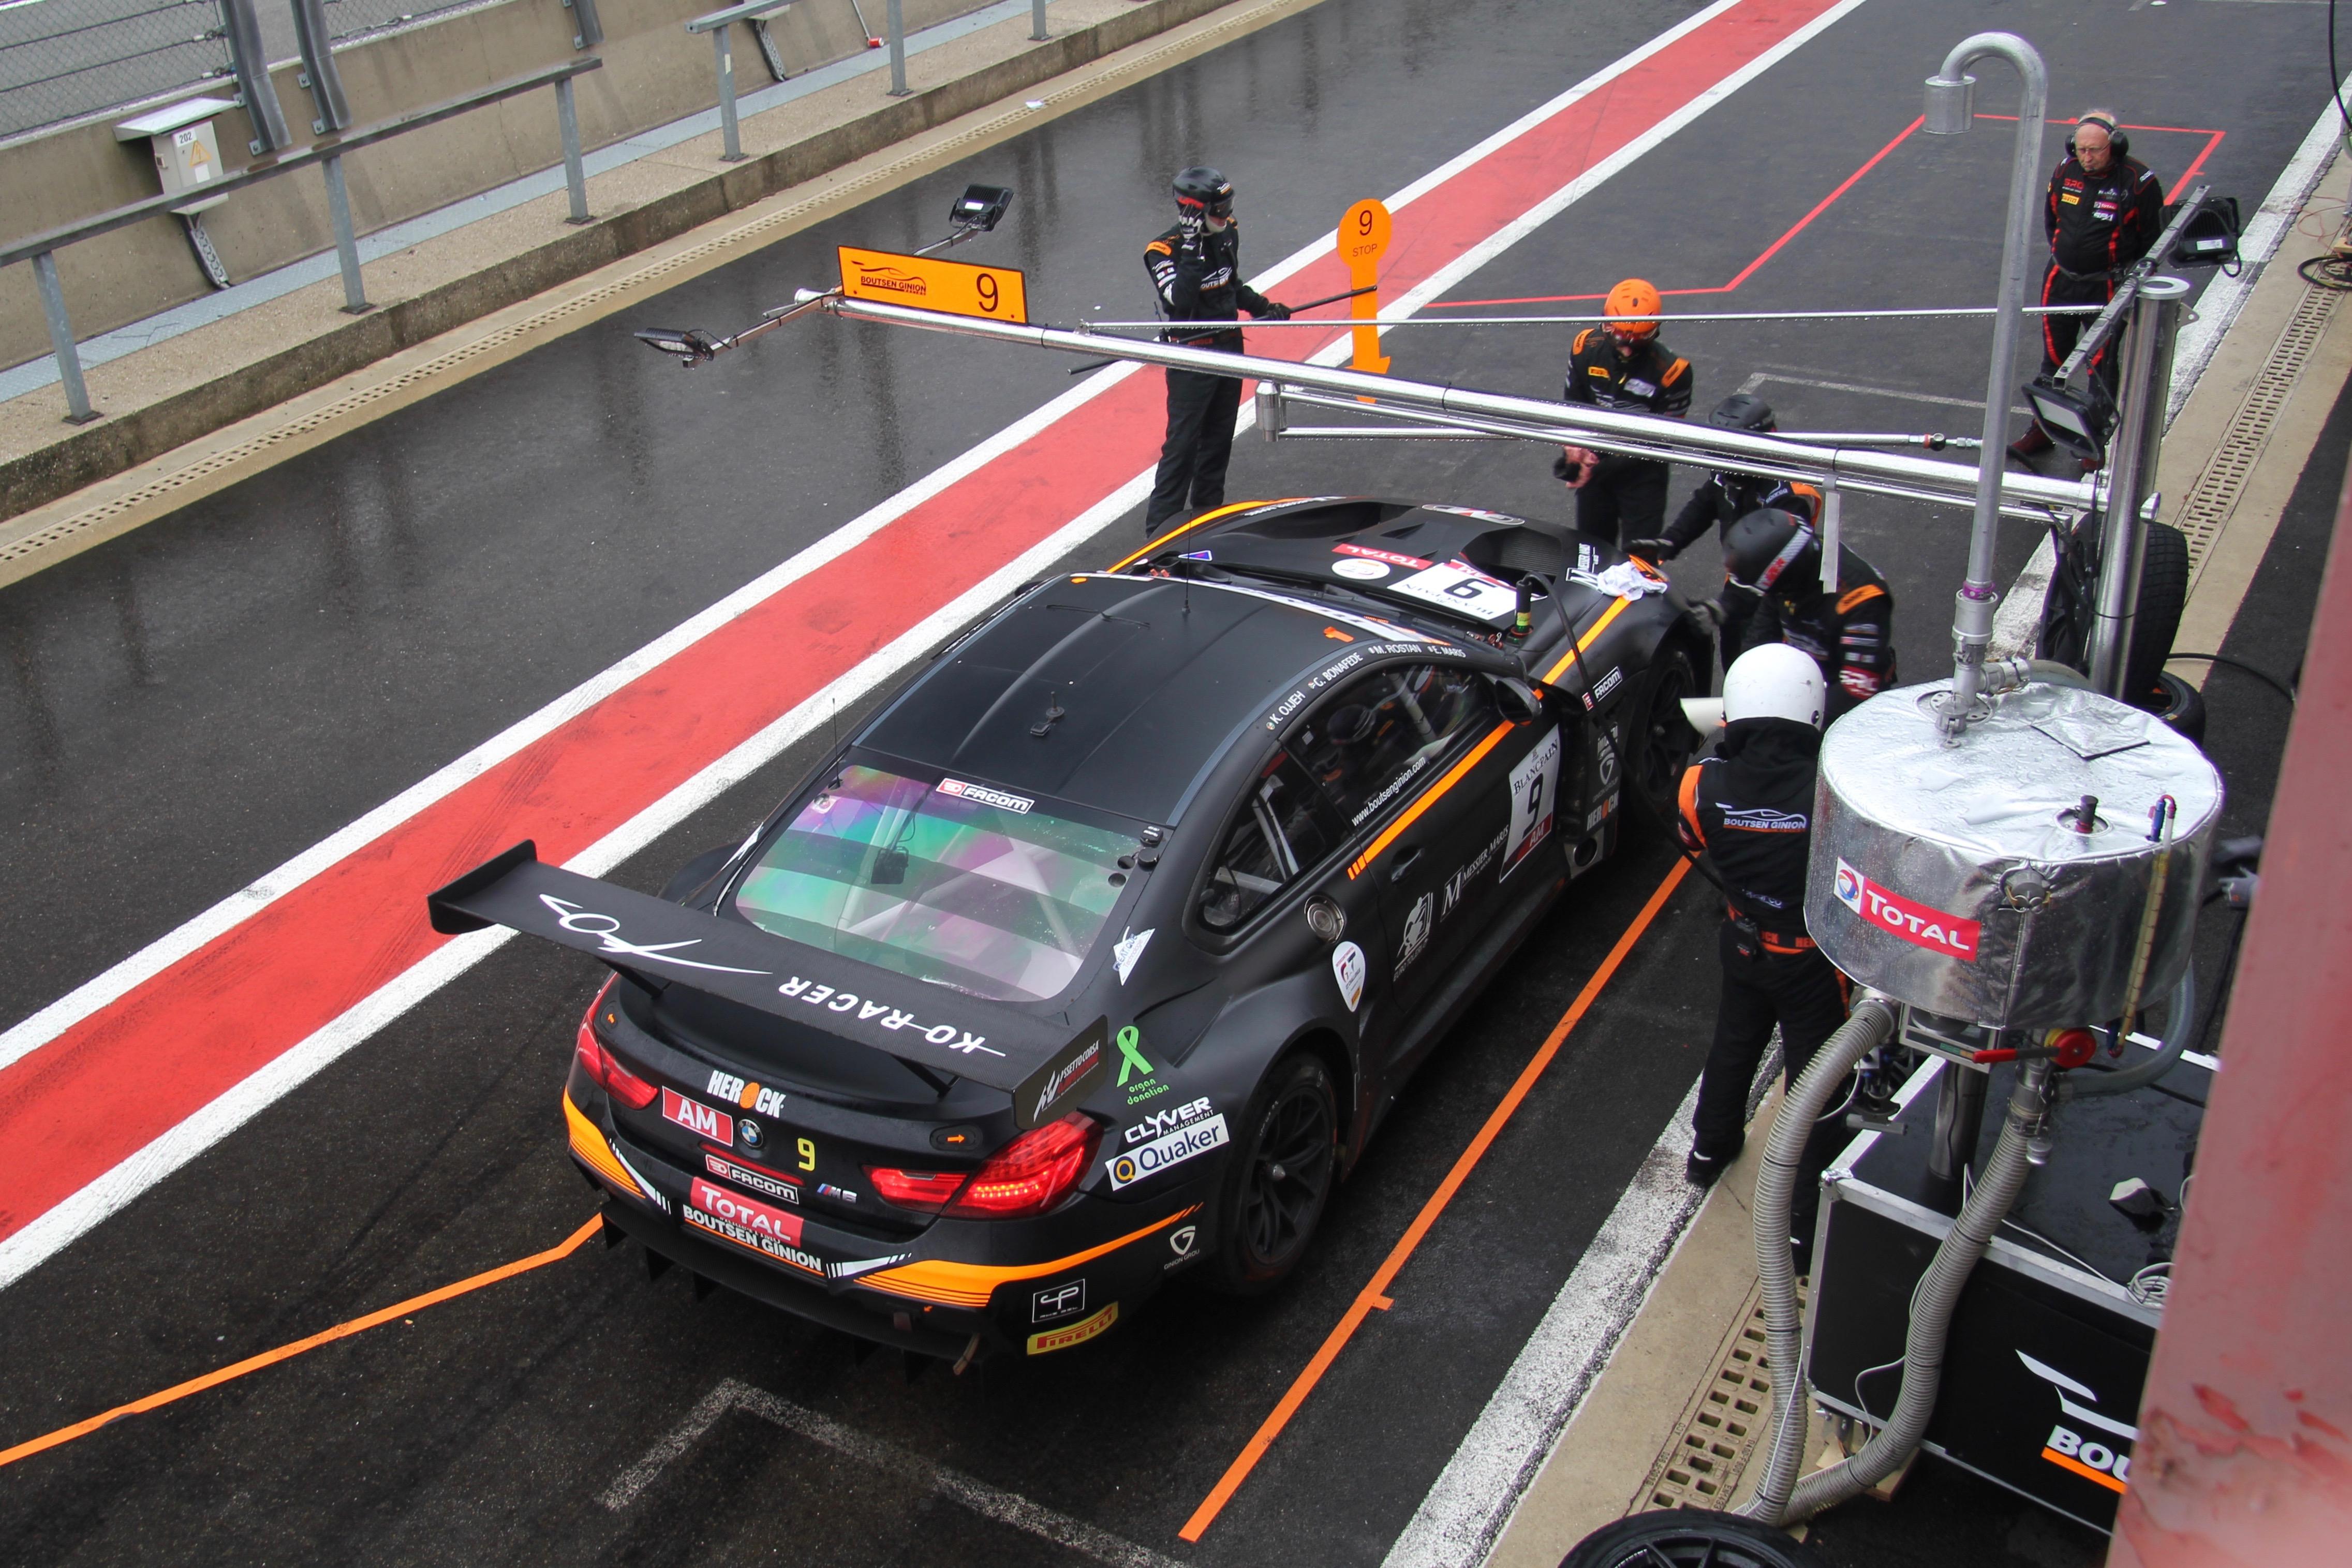 BMW M6 GT3 - n9 - Total 24 Heures de Spa 2019 - photo Ludo Ferrari